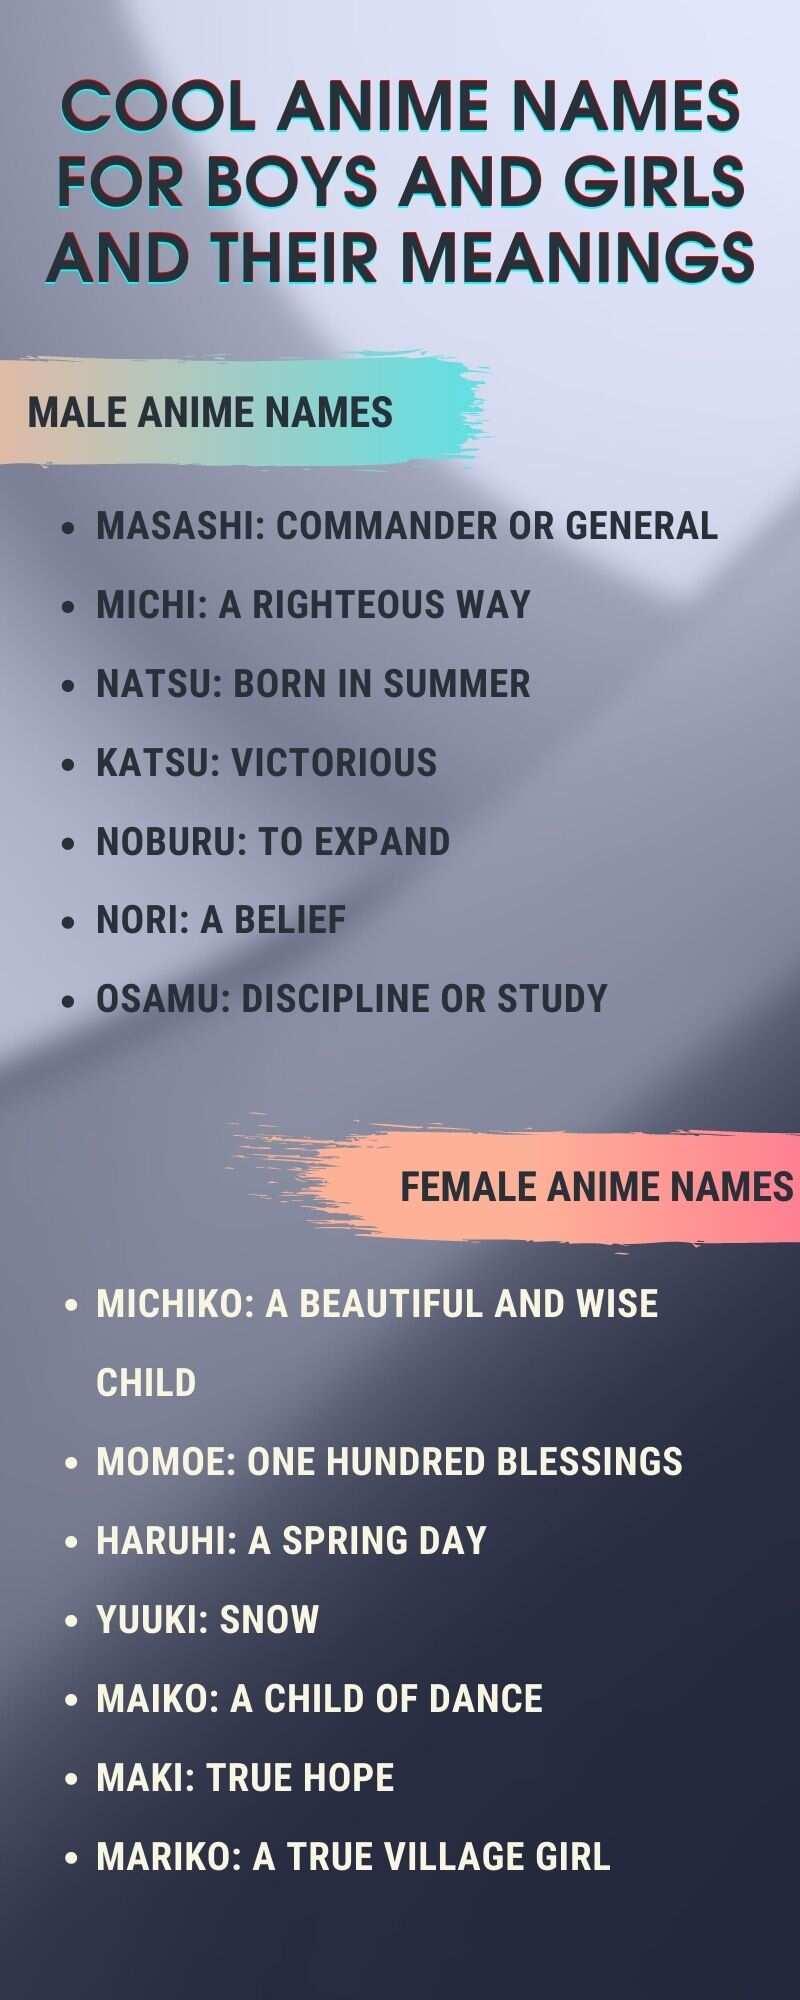 anime names for boys and girls